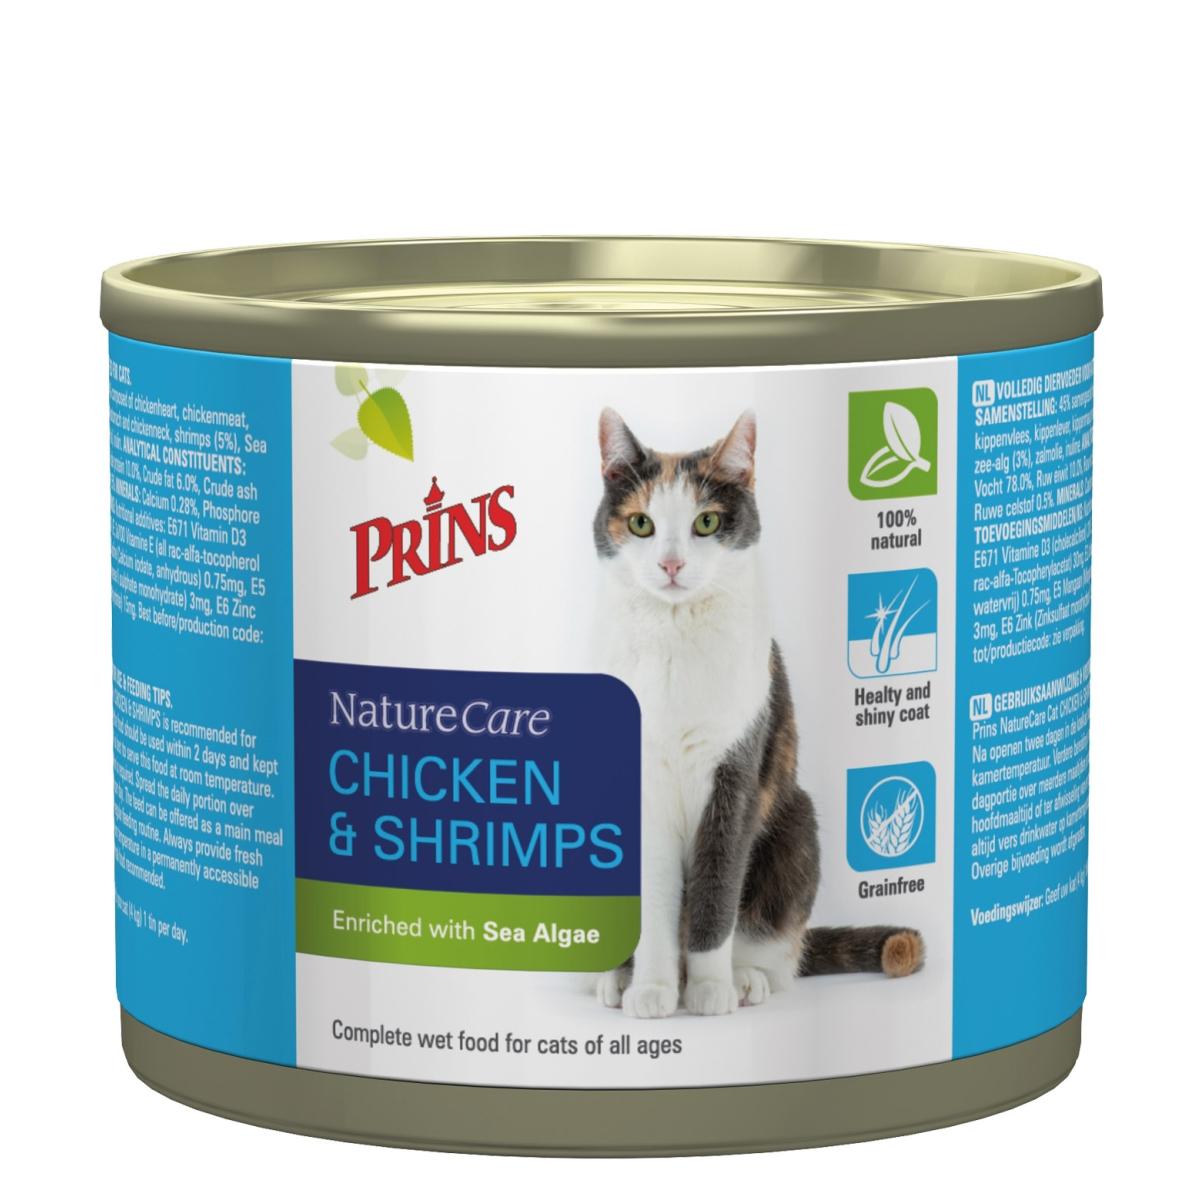 PRI NC CAT CHIC&SHRIMPS 200GR J 00003